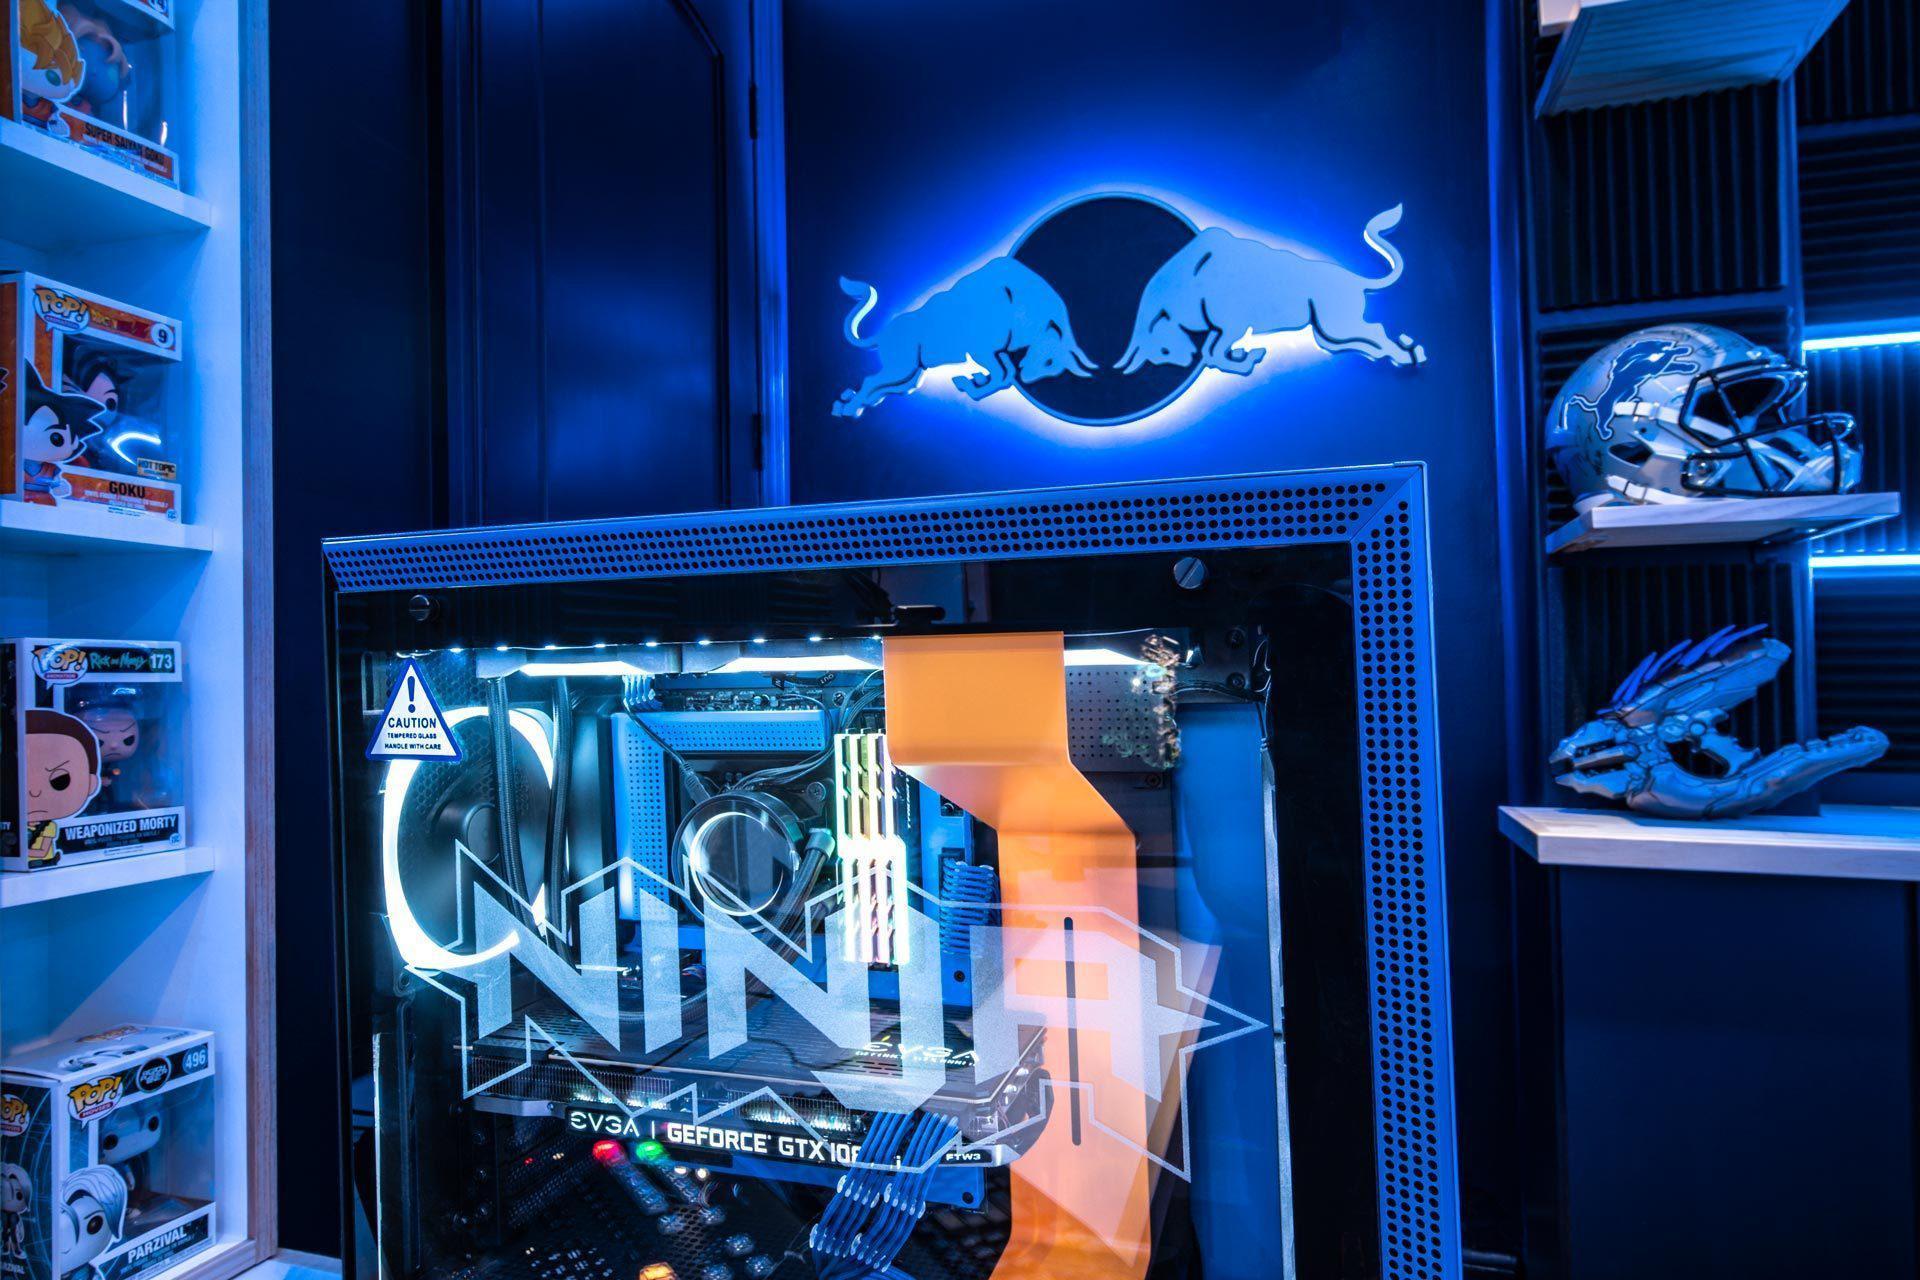 Red Bull Ninja Studio R4 C1 V1